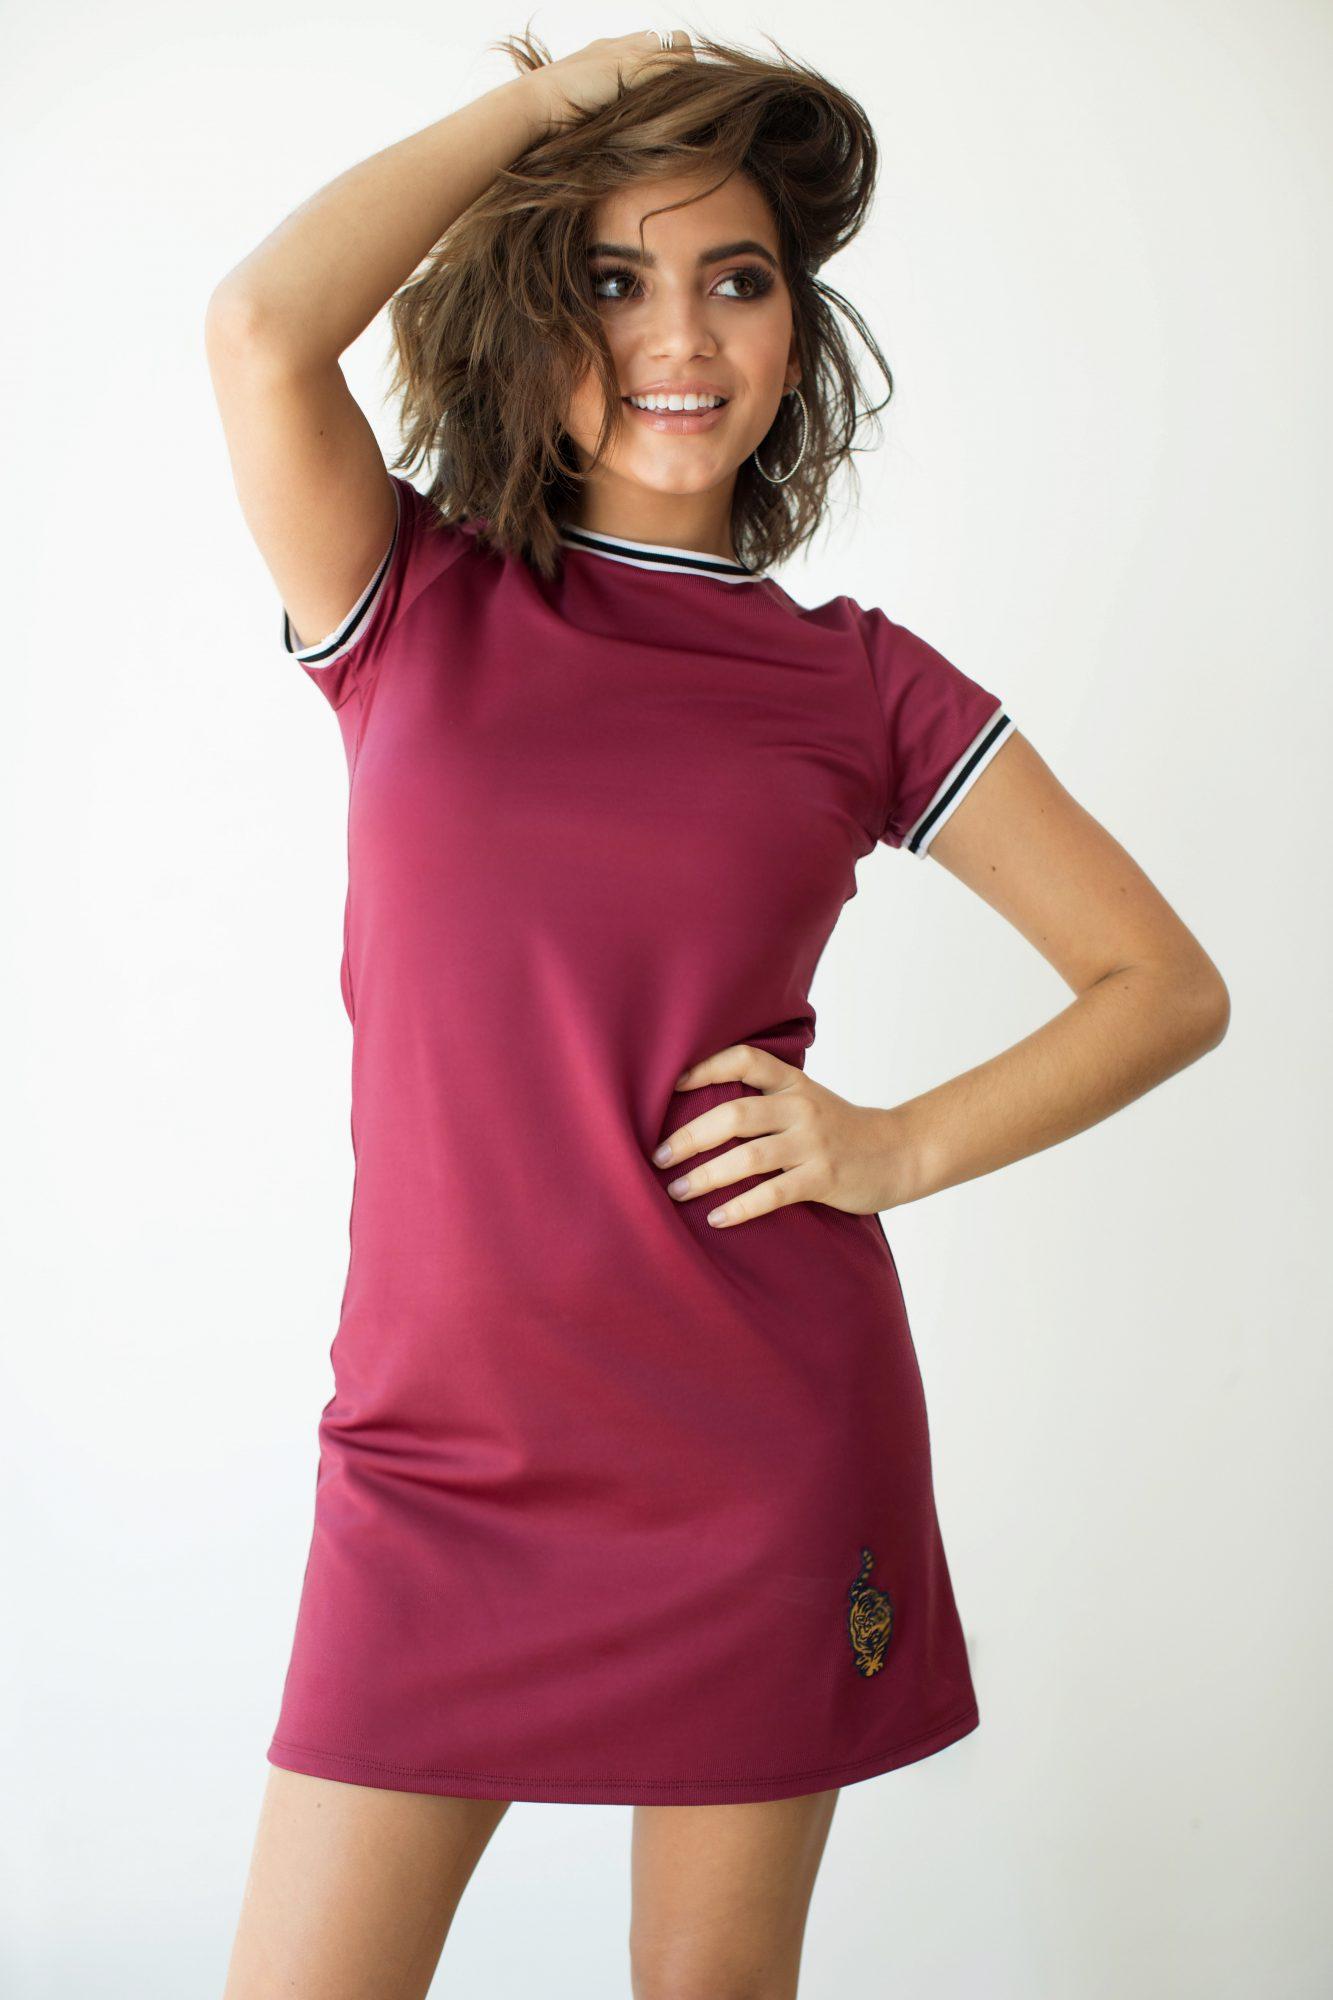 Isabela Moner, coleccion, jcpenney